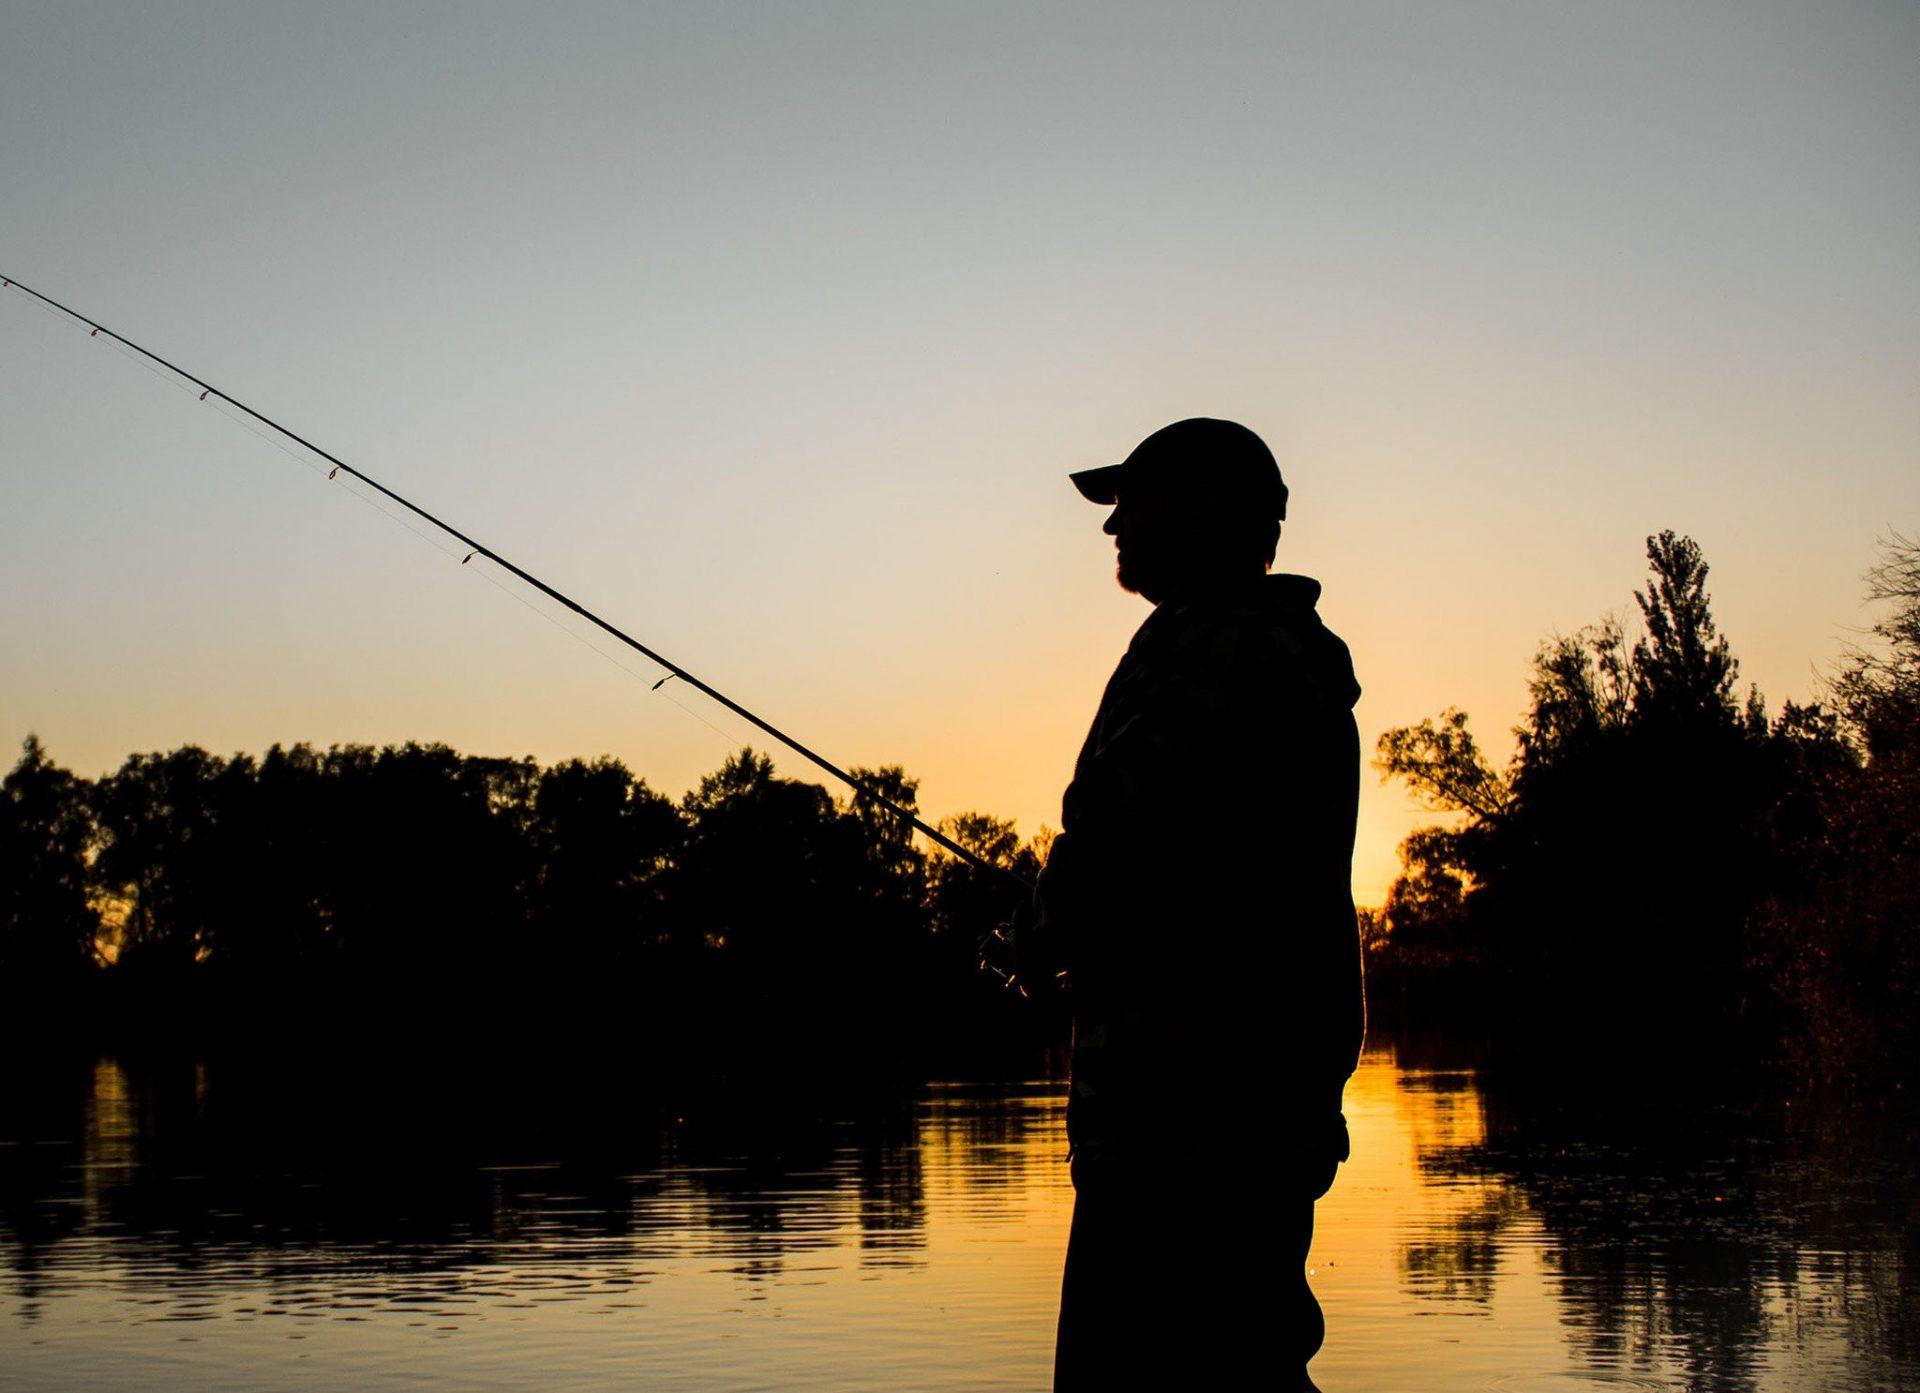 Person fishing at night